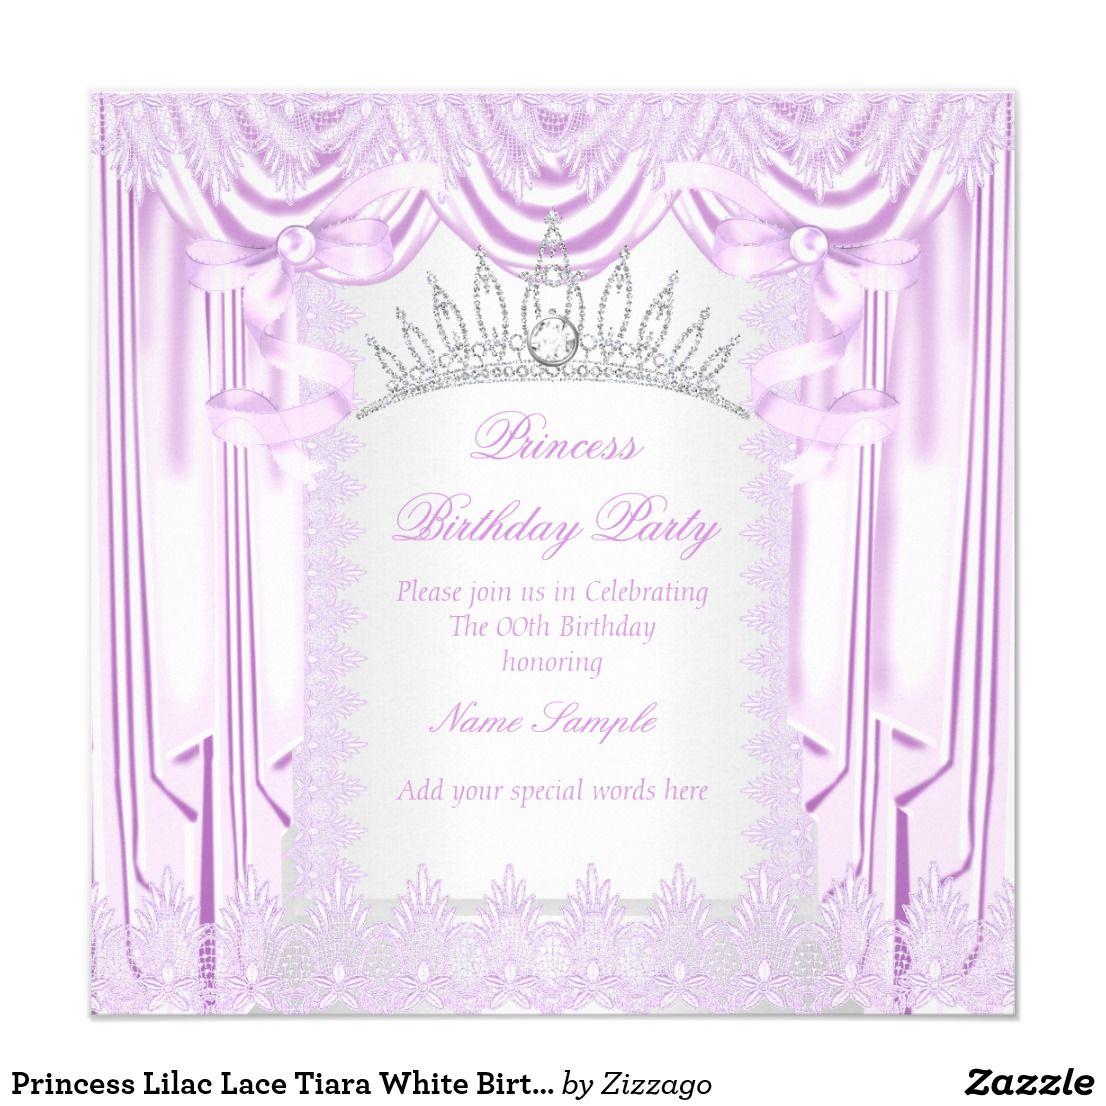 Princess Lilac Lace Tiara White Birthday Party Card Elegant Princess ...